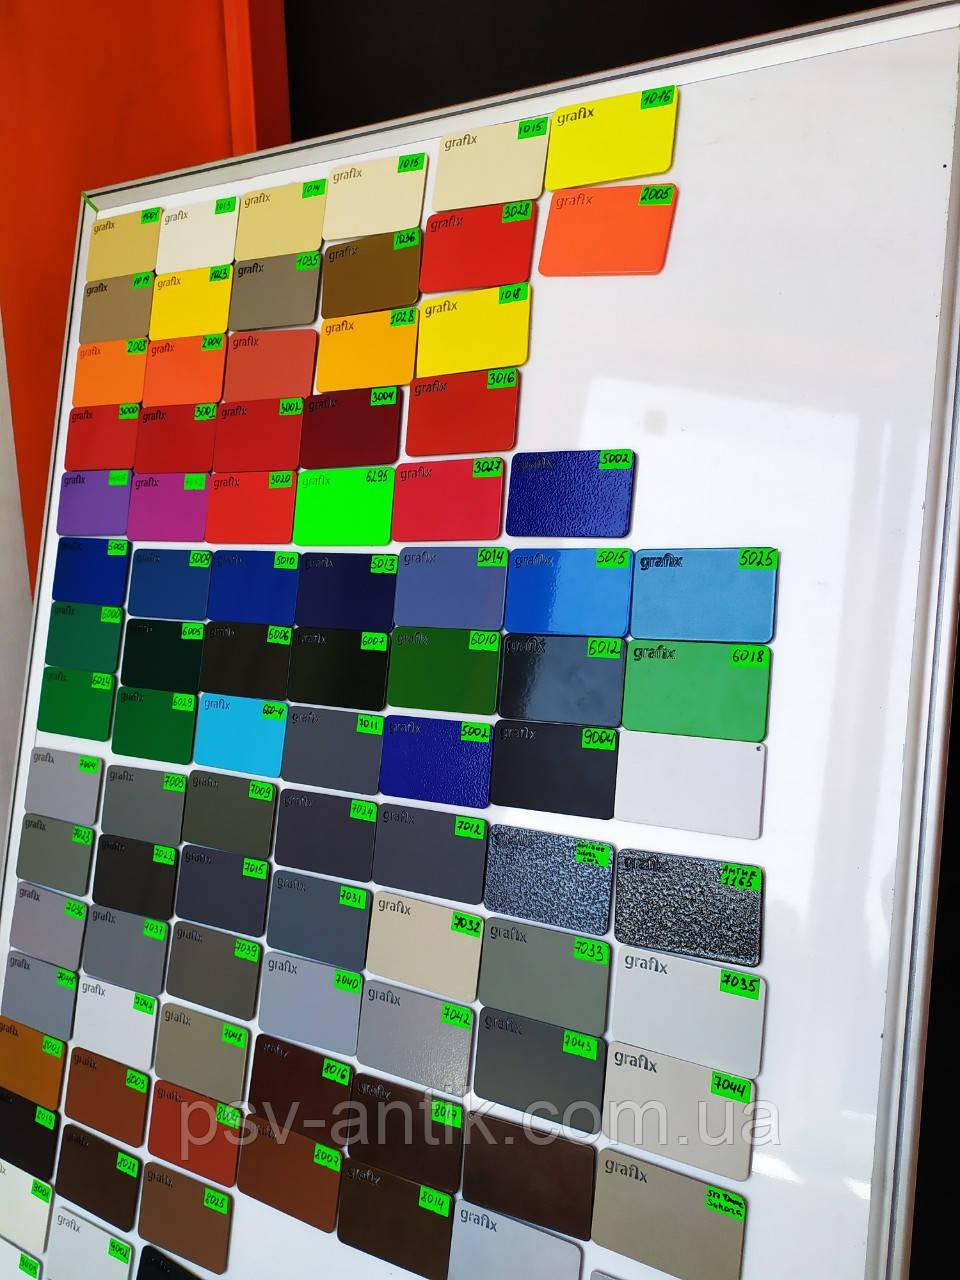 Порошковая краска глянцевая, полиэфирная, архитектурная, 7003